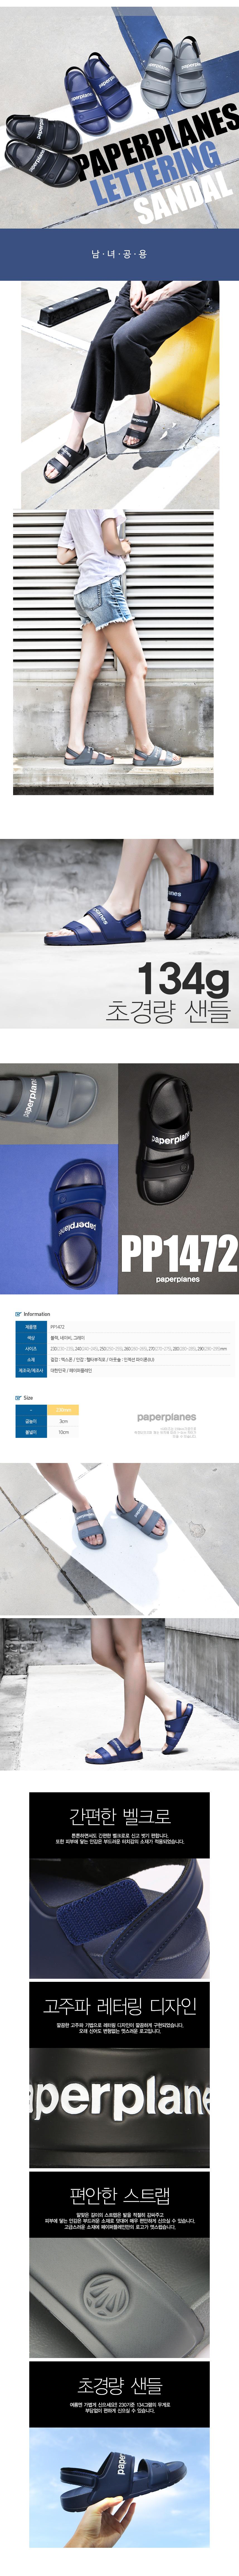 pp1472_intro.jpg